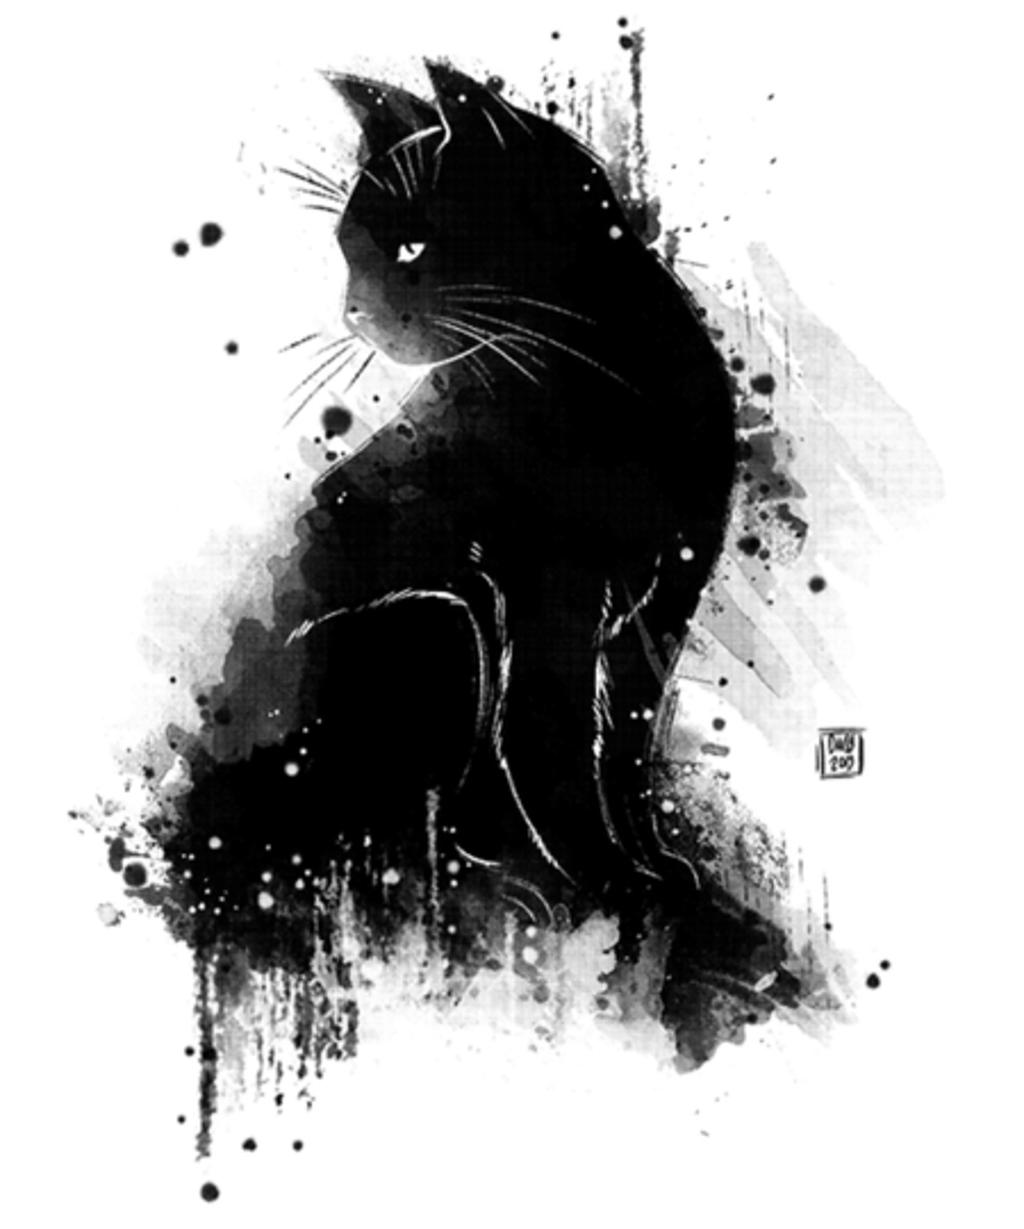 Qwertee: Inky cat